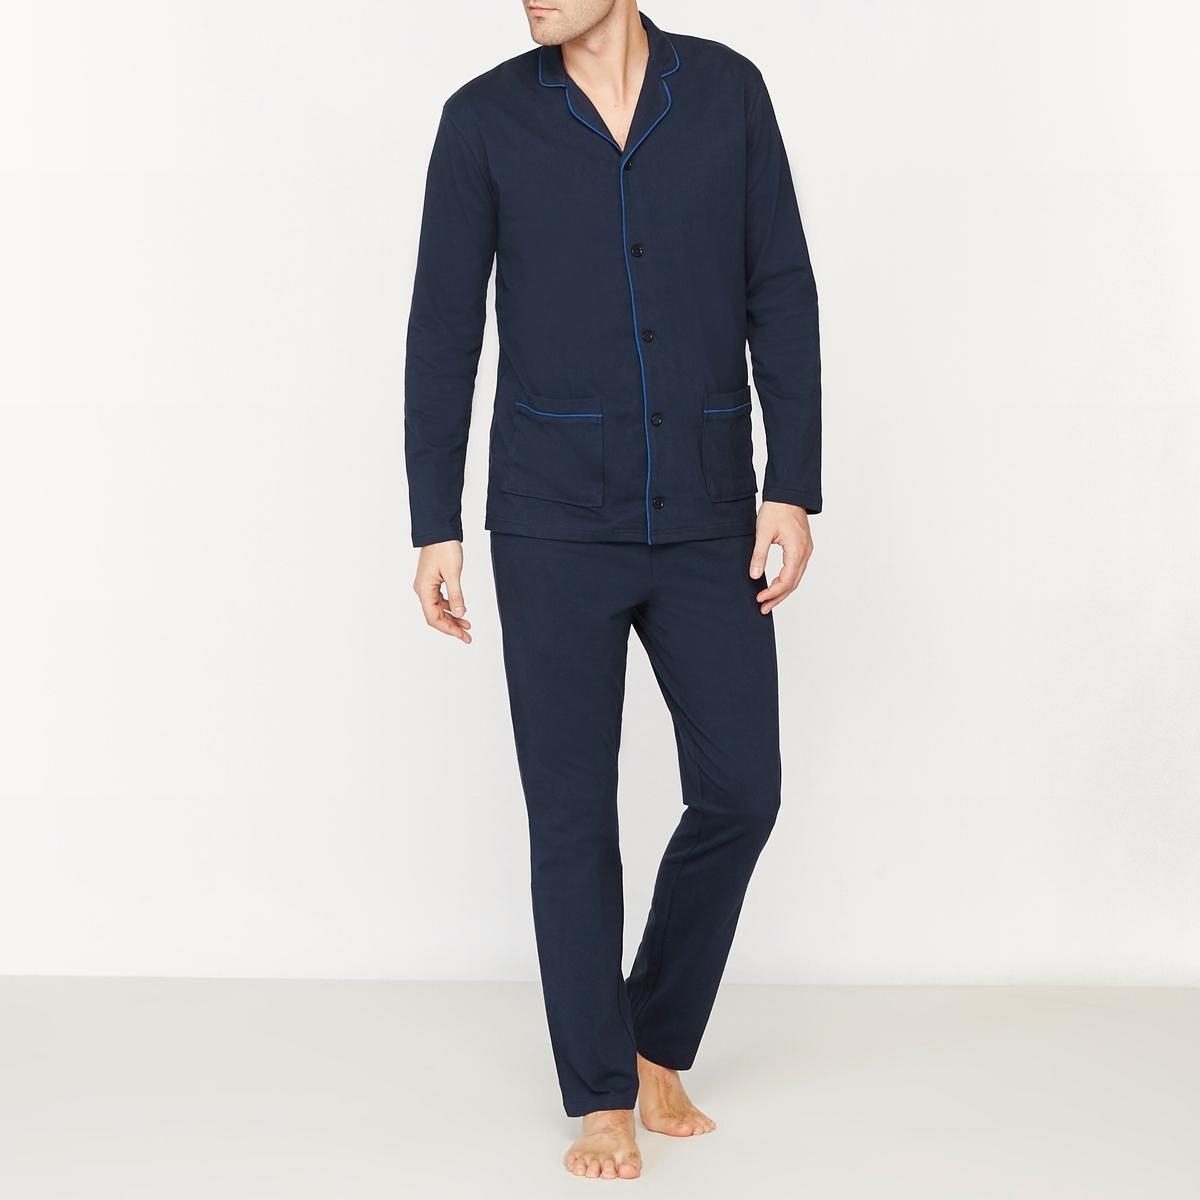 Пижама с жакетом из джерси пижама из атласа и джерси